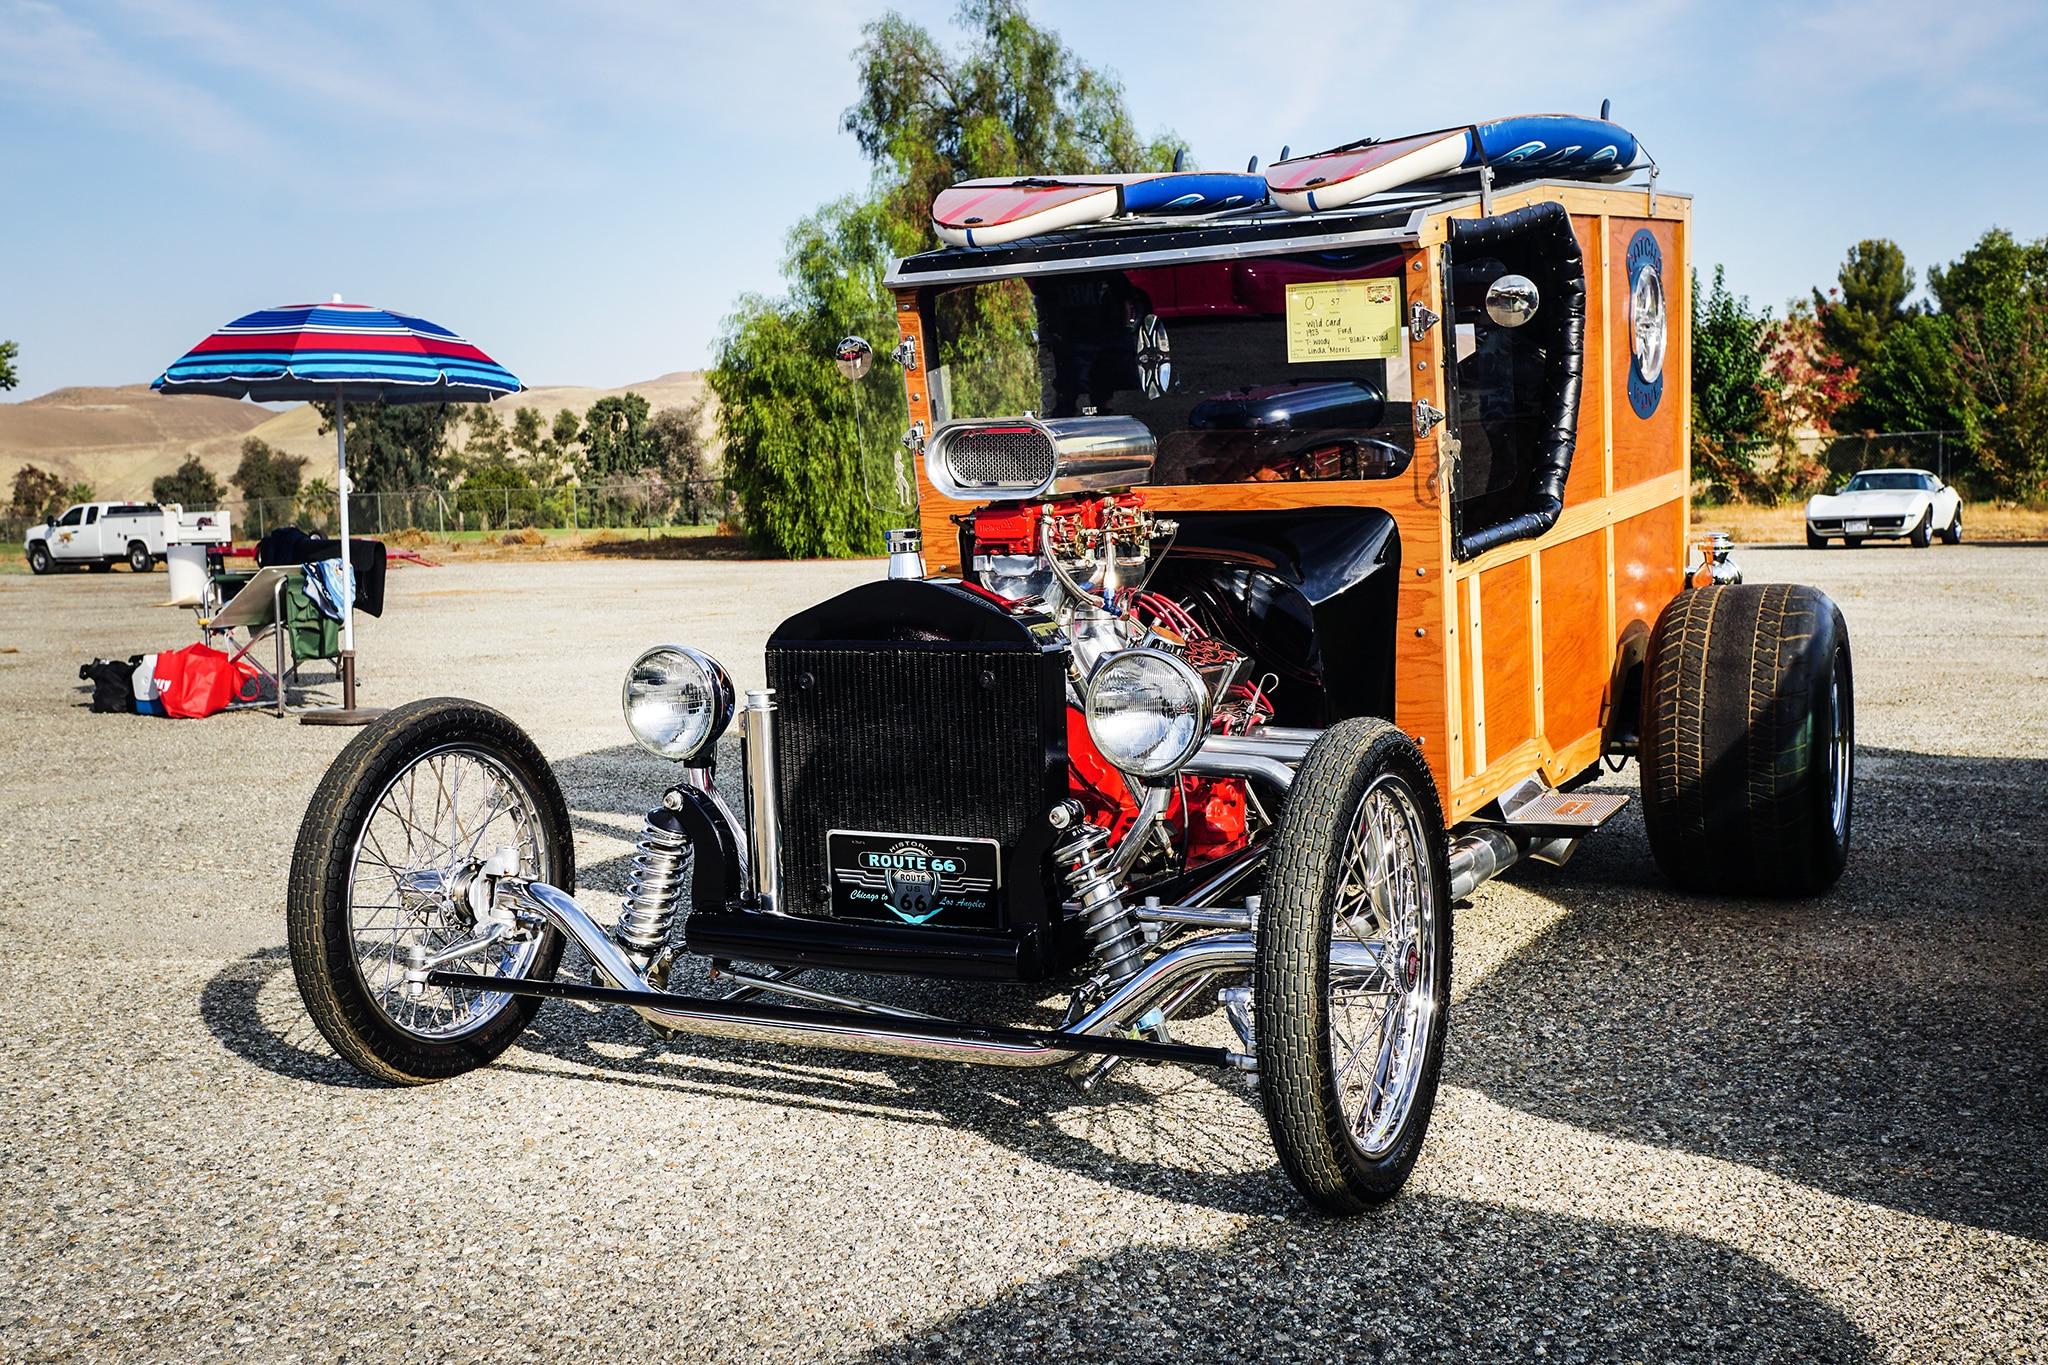 Chevy Classic Club Th Annual Car Show Automobile Magazine - Route 66 cruisers car show list